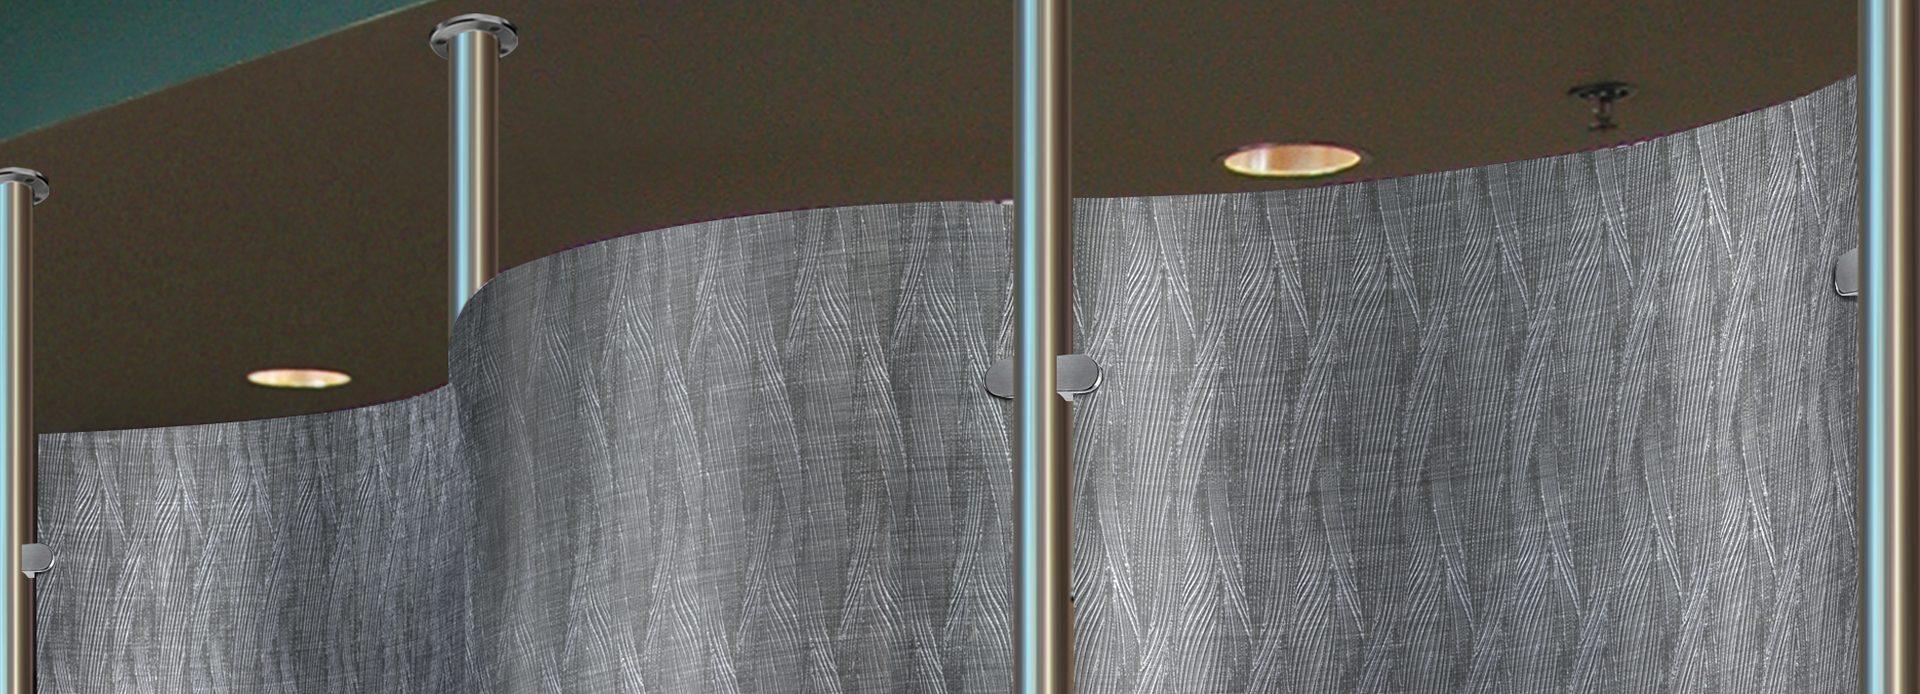 Metal Room Divider, Perforated, Moz Designer Metals